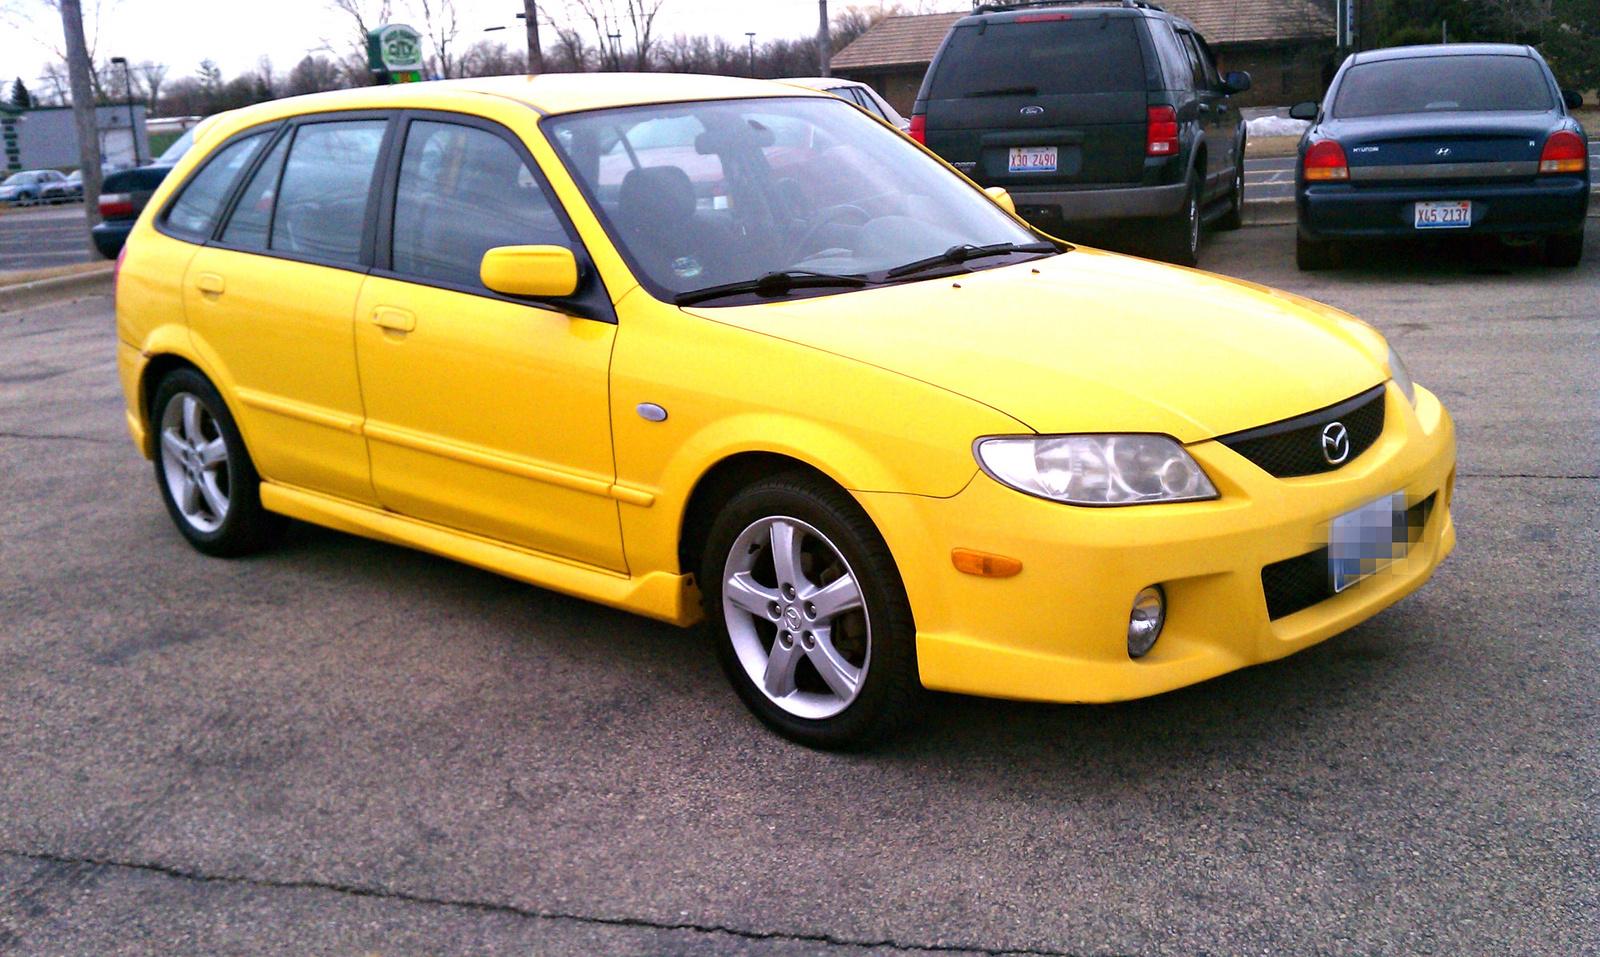 Mazda Protege Dr Std Wagon Pic on 2002 Mazda Protege 5 Wagon Interior